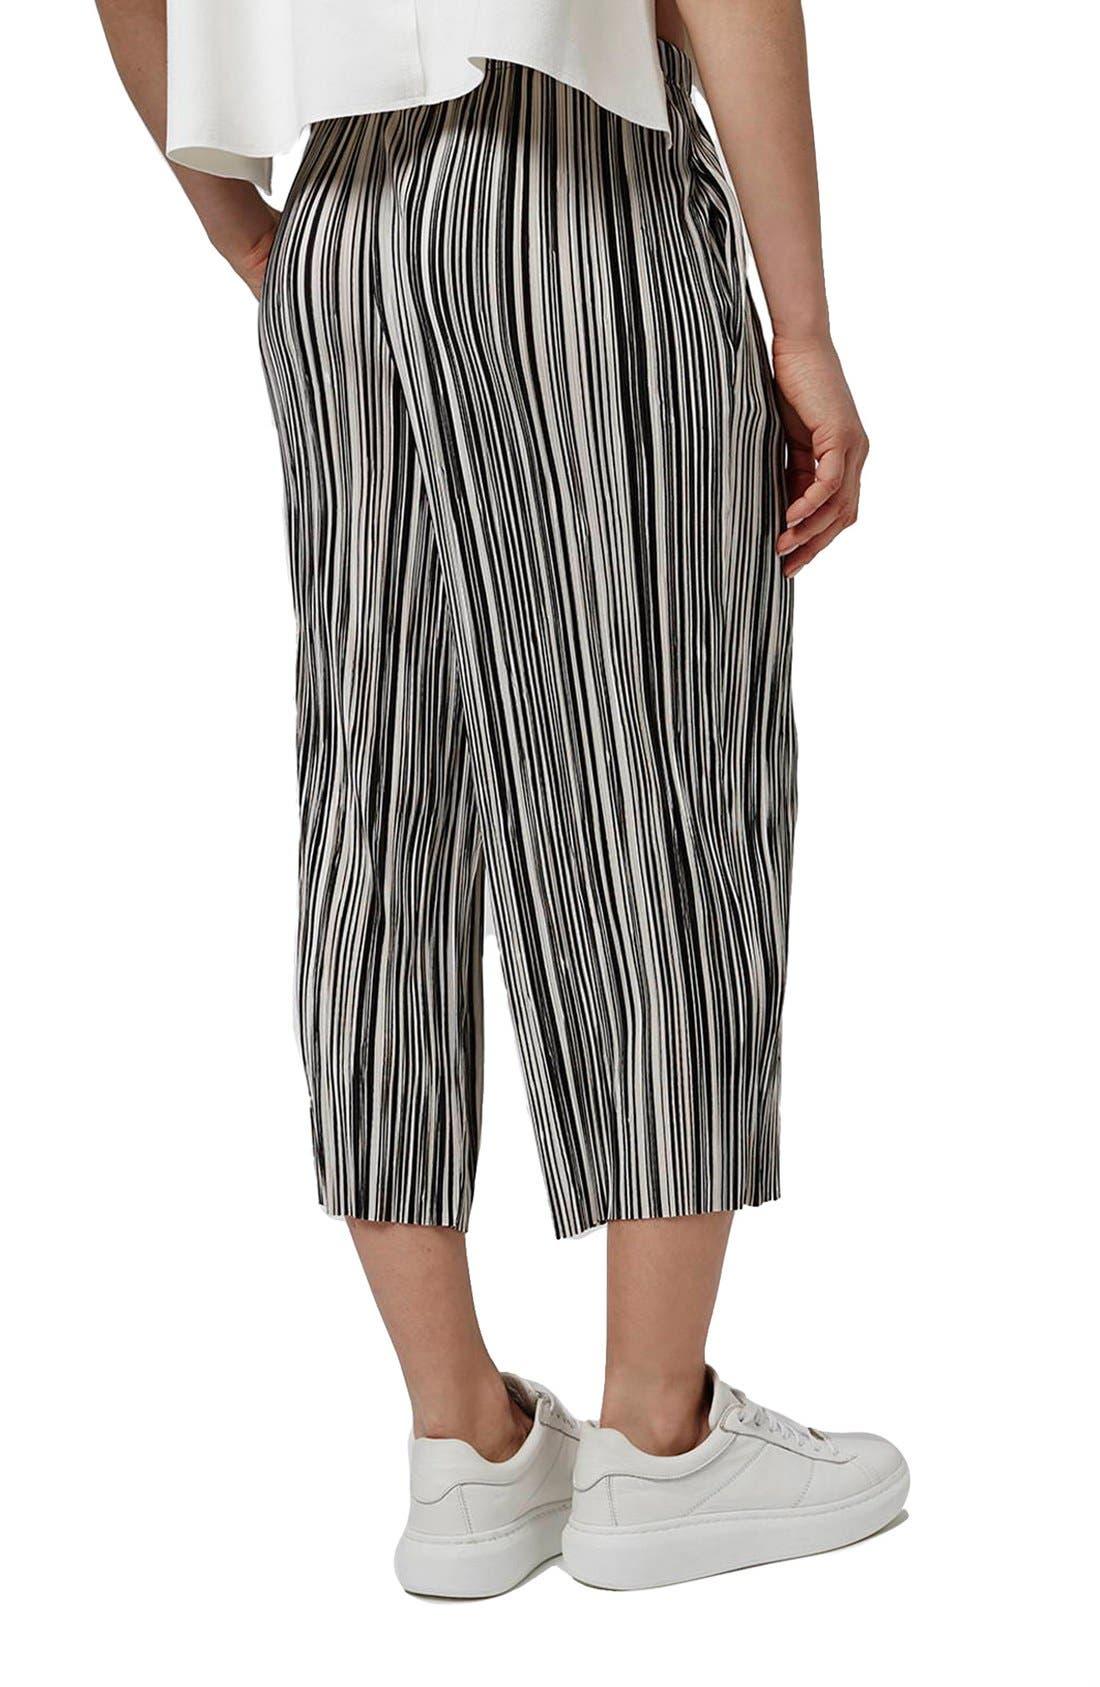 Alternate Image 3  - Topshop Pleat Stripe Crop Trousers (Petite)